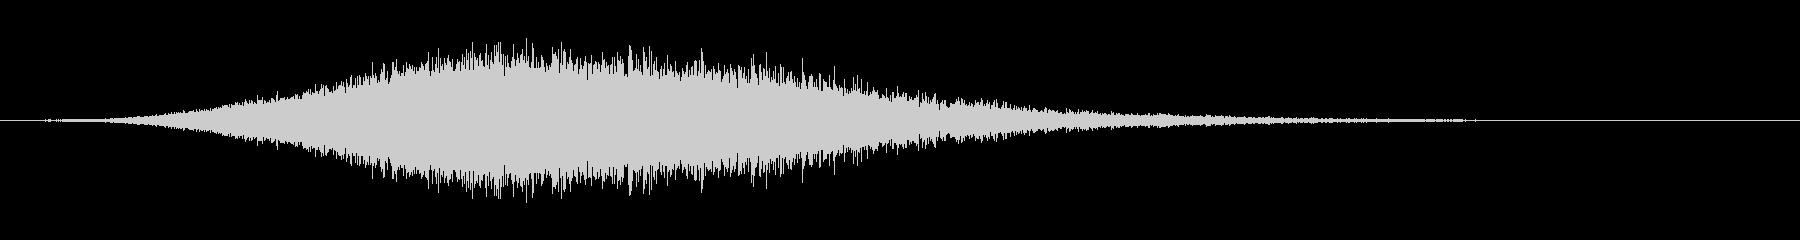 FMラジオジングル効果音SWEEPERの未再生の波形